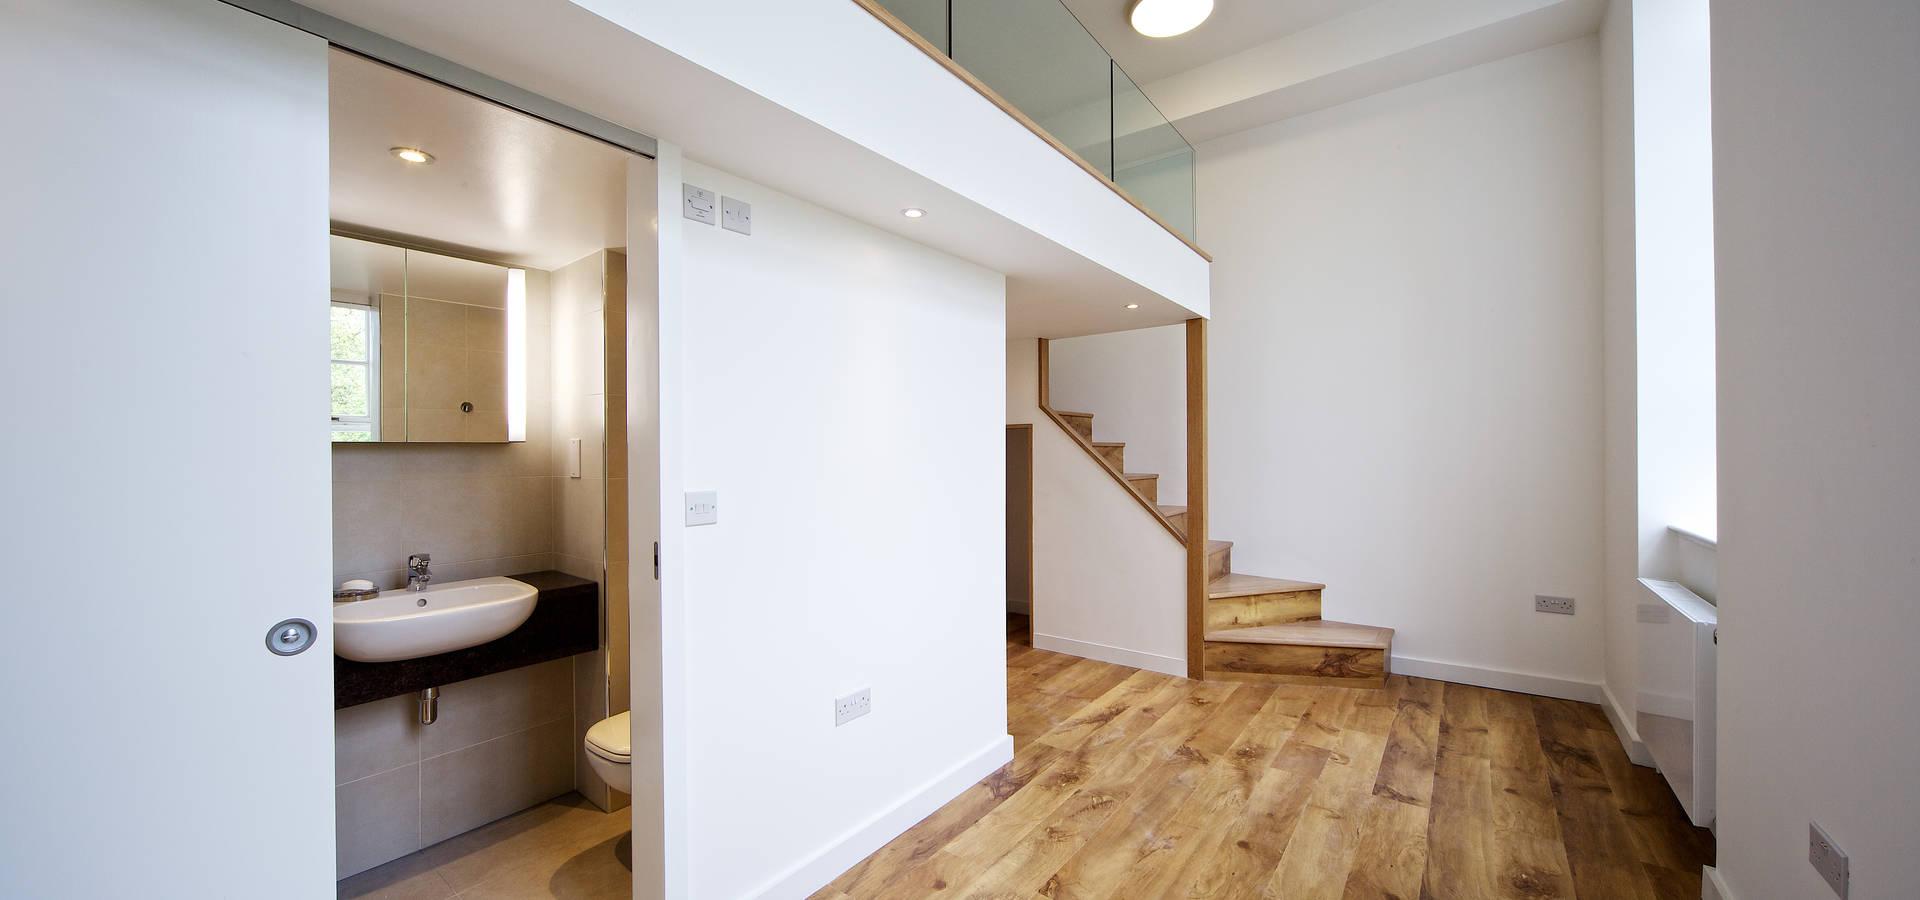 Ceetoo Architects